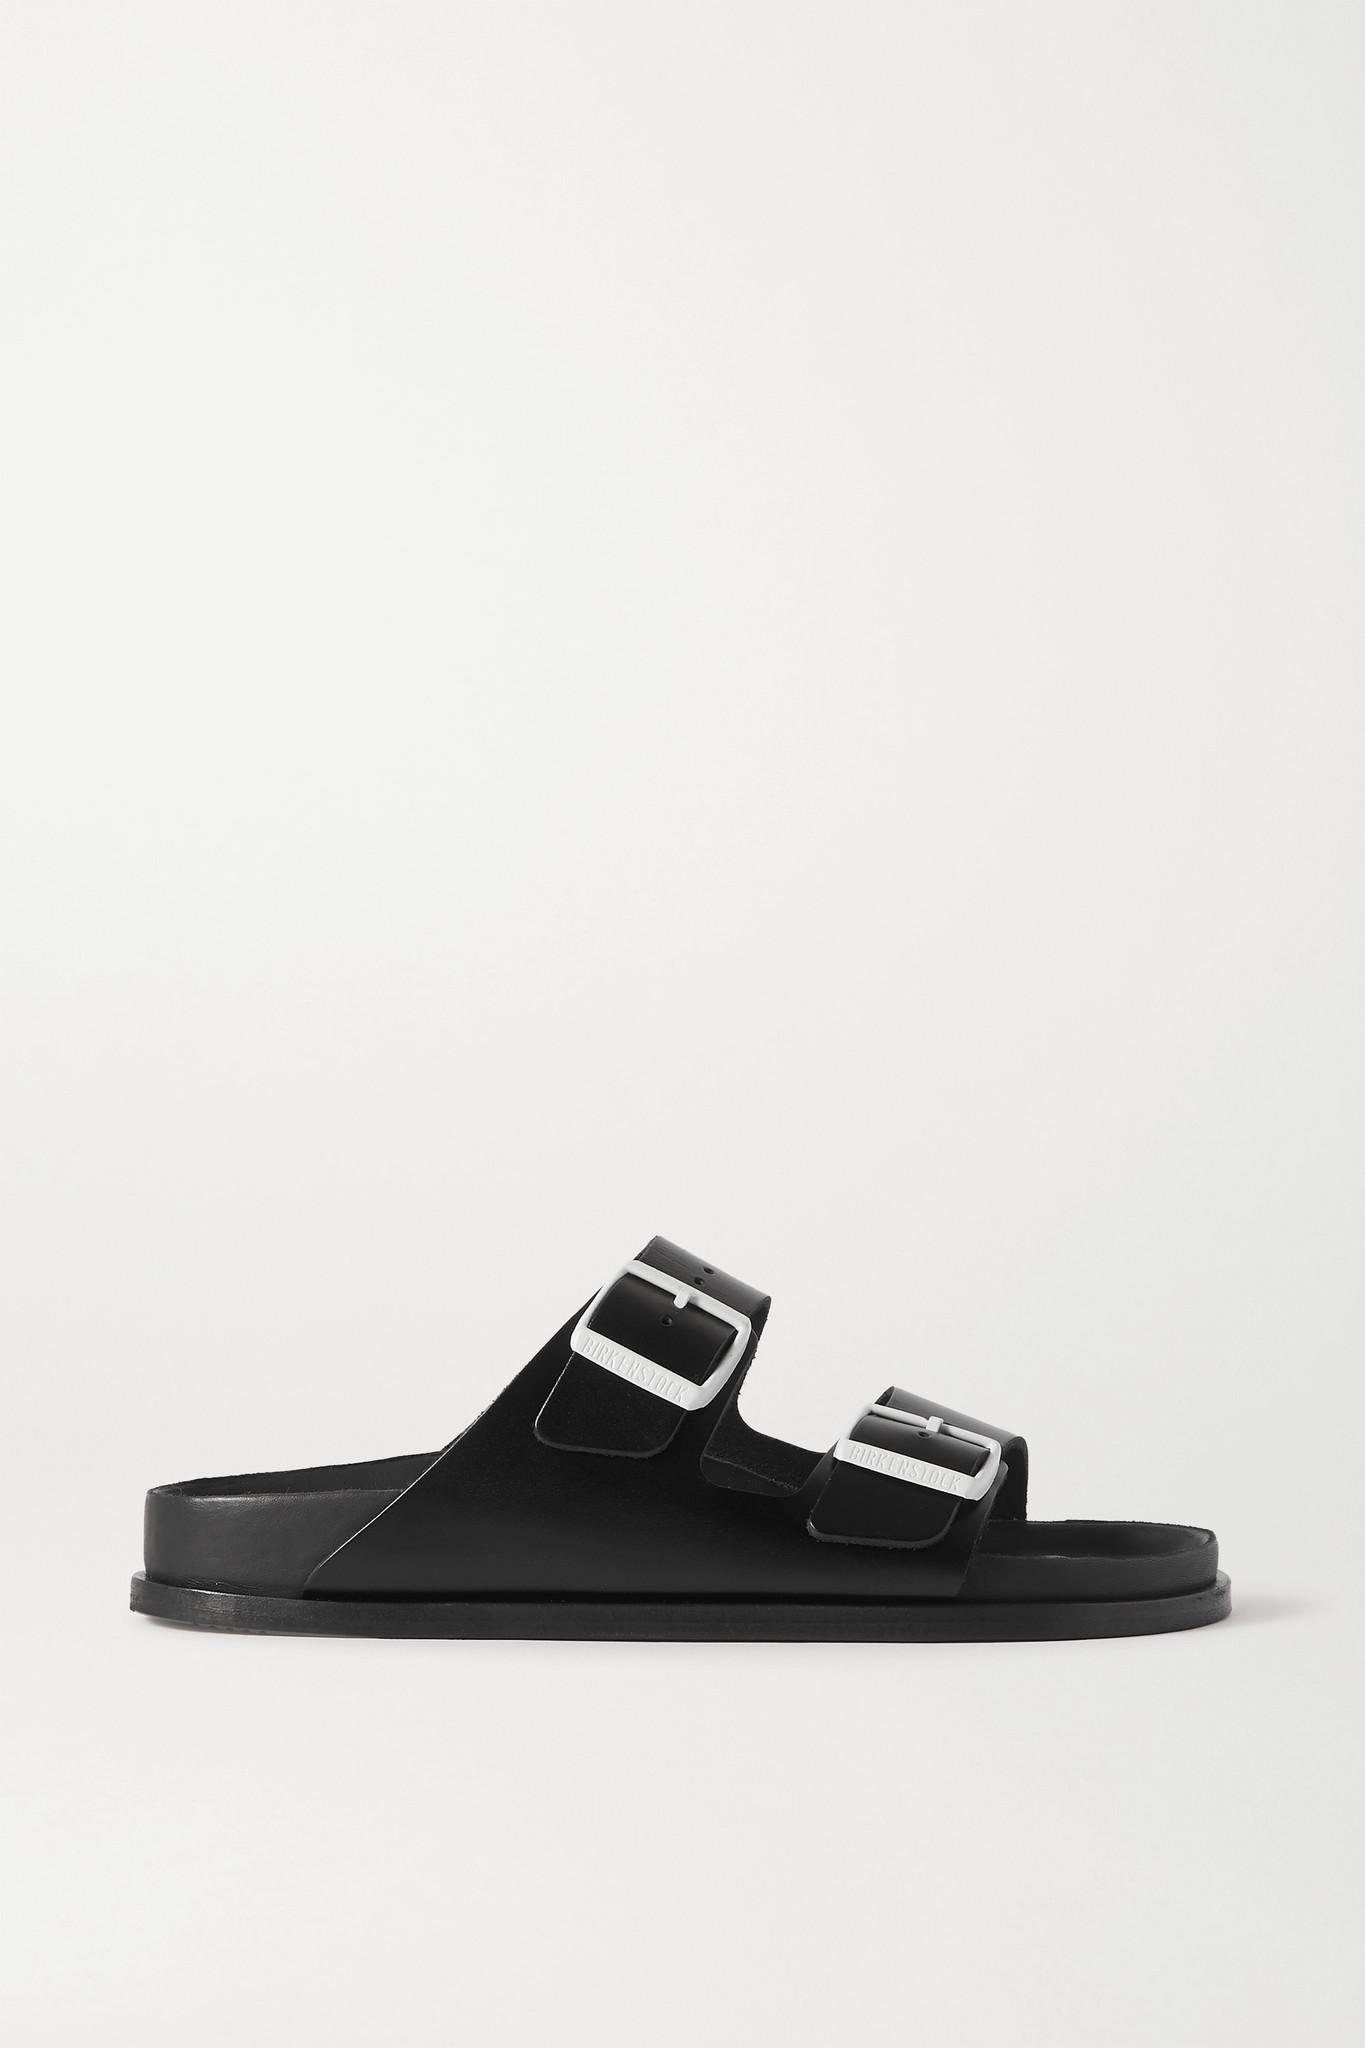 BIRKENSTOCK - Arizona Leather Sandals - Black - IT39